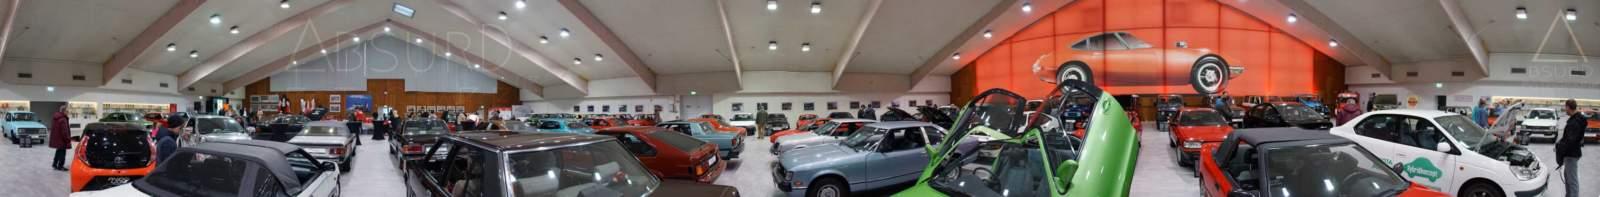 2019-01-05-Toyota-Collection-Koeln - Unbenanntes_Panorama1a_web.jpg